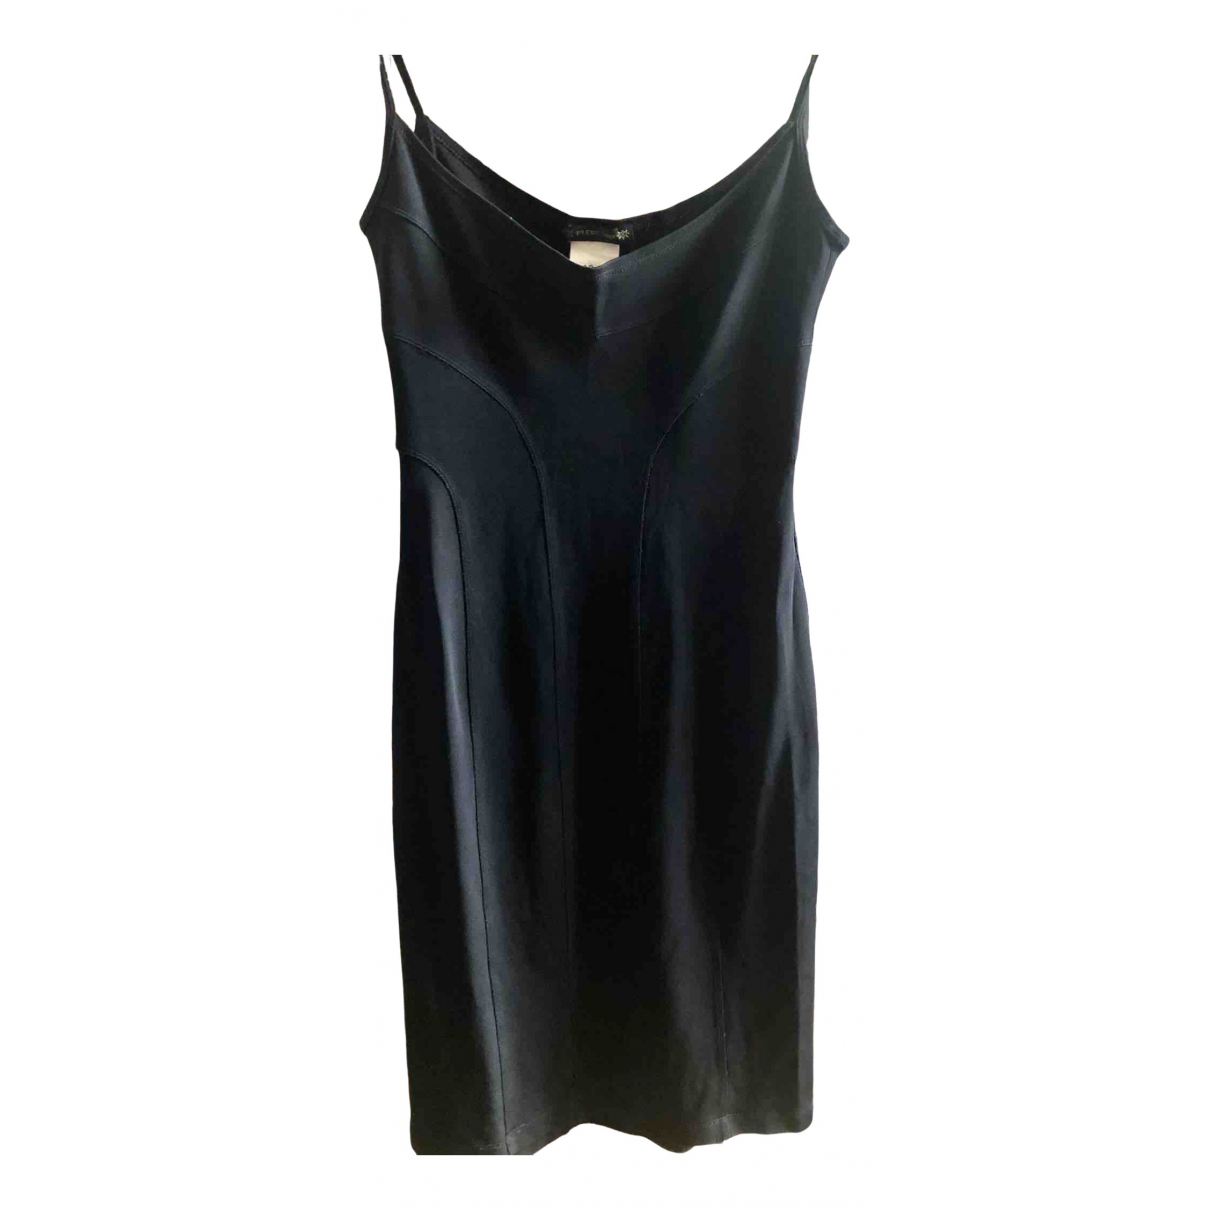 Plein Sud \N Kleid in  Schwarz Baumwolle - Elasthan